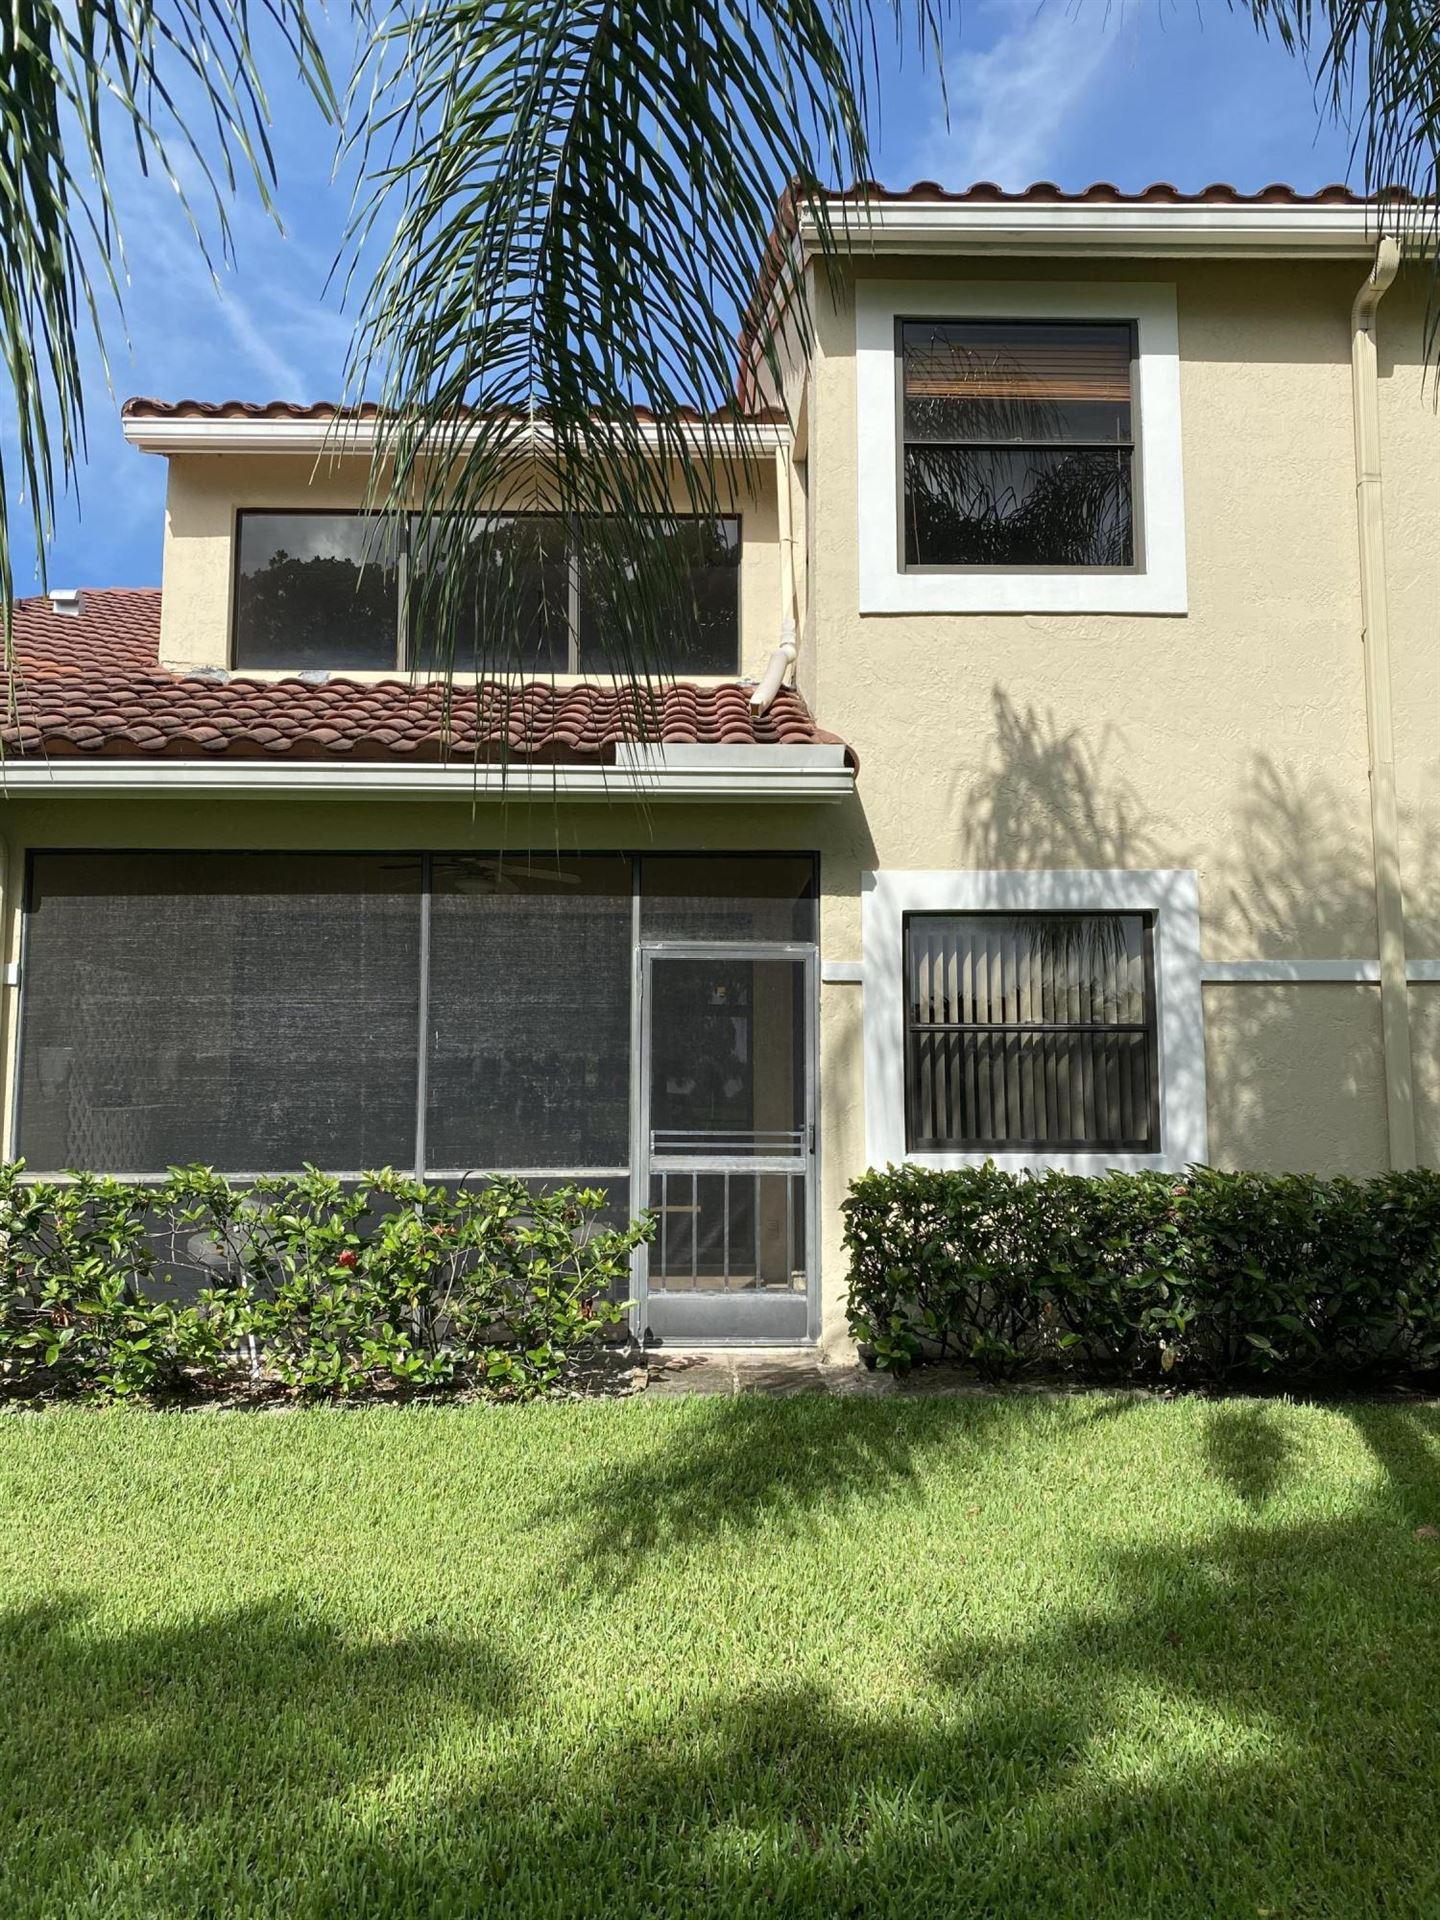 Photo of 866 Windermere Way, Palm Beach Gardens, FL 33418 (MLS # RX-10651261)